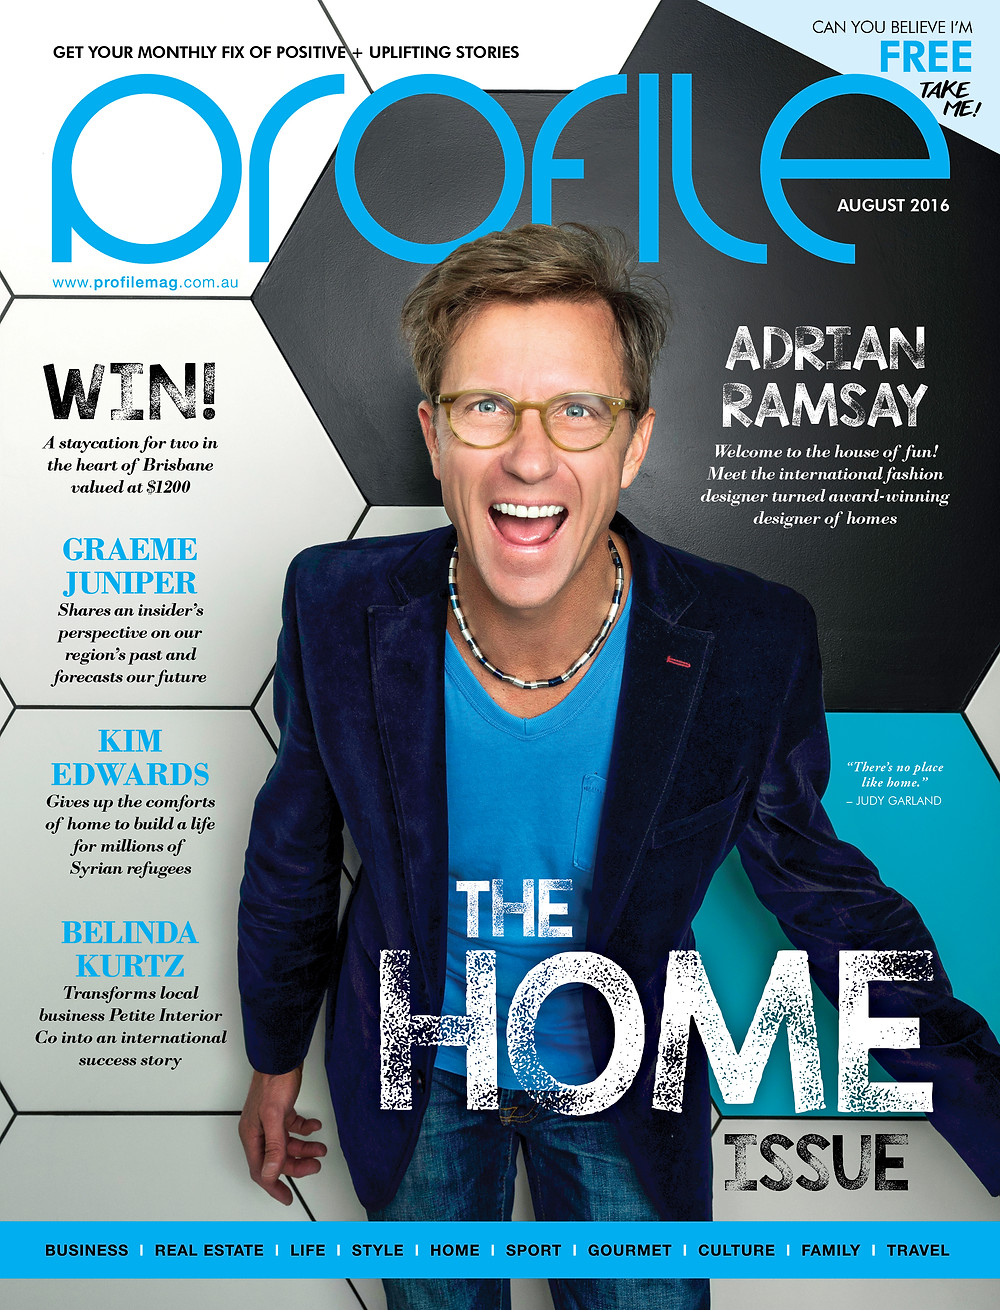 Profile Magazine Adrian Ramsay Cover Story